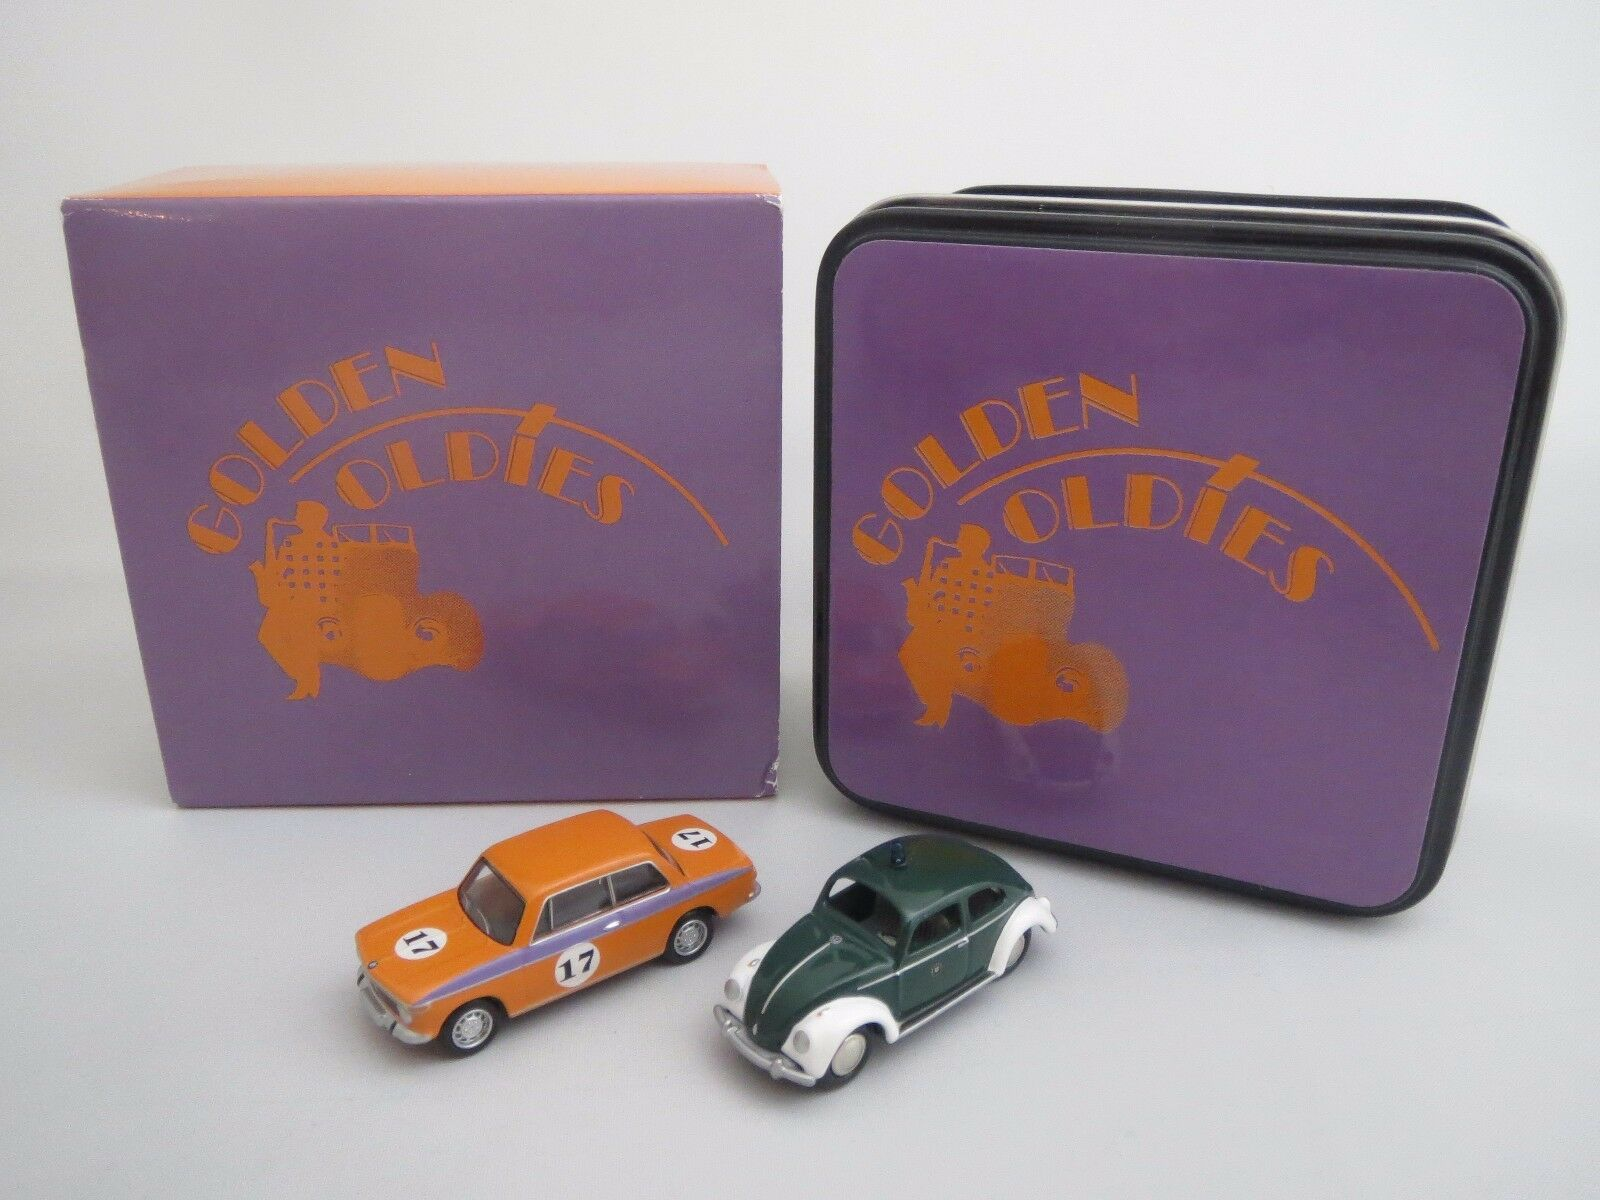 Bouèbe exclusivement-Set (oren Oldies) BMW 2002 & VW Beetle  2006  1 87 Neuf dans sa boîte